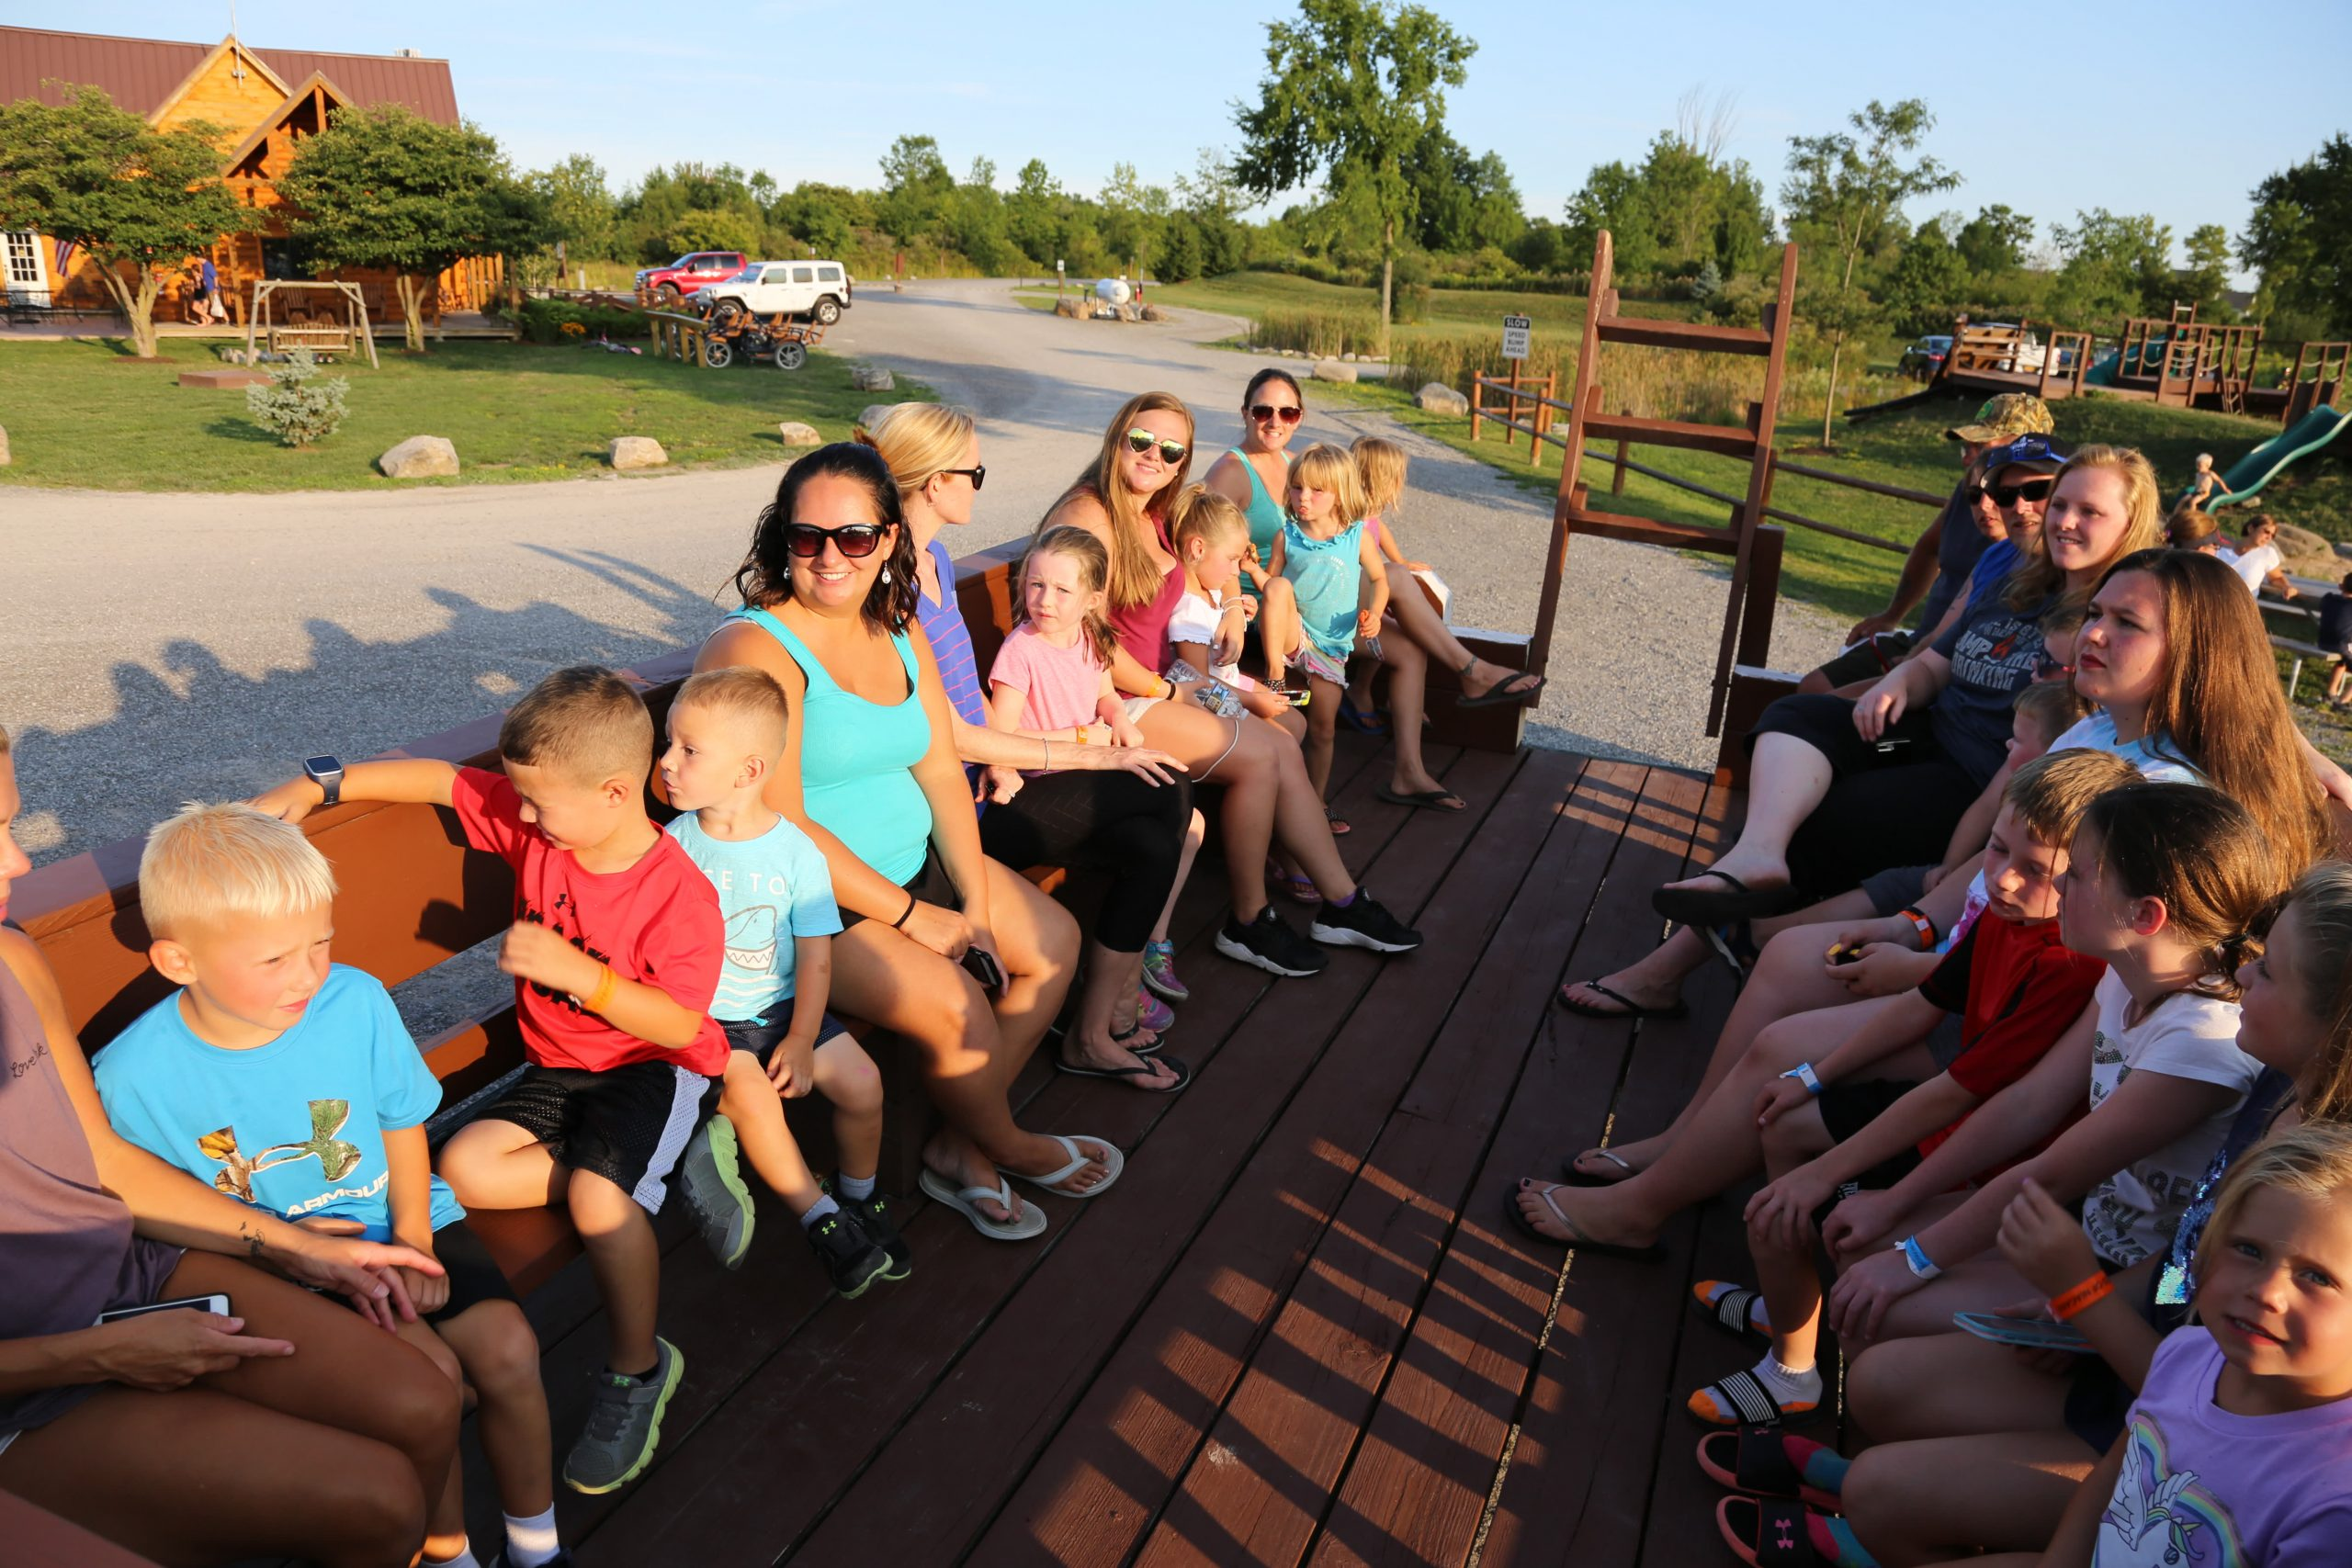 kids and adults sitting on wagon